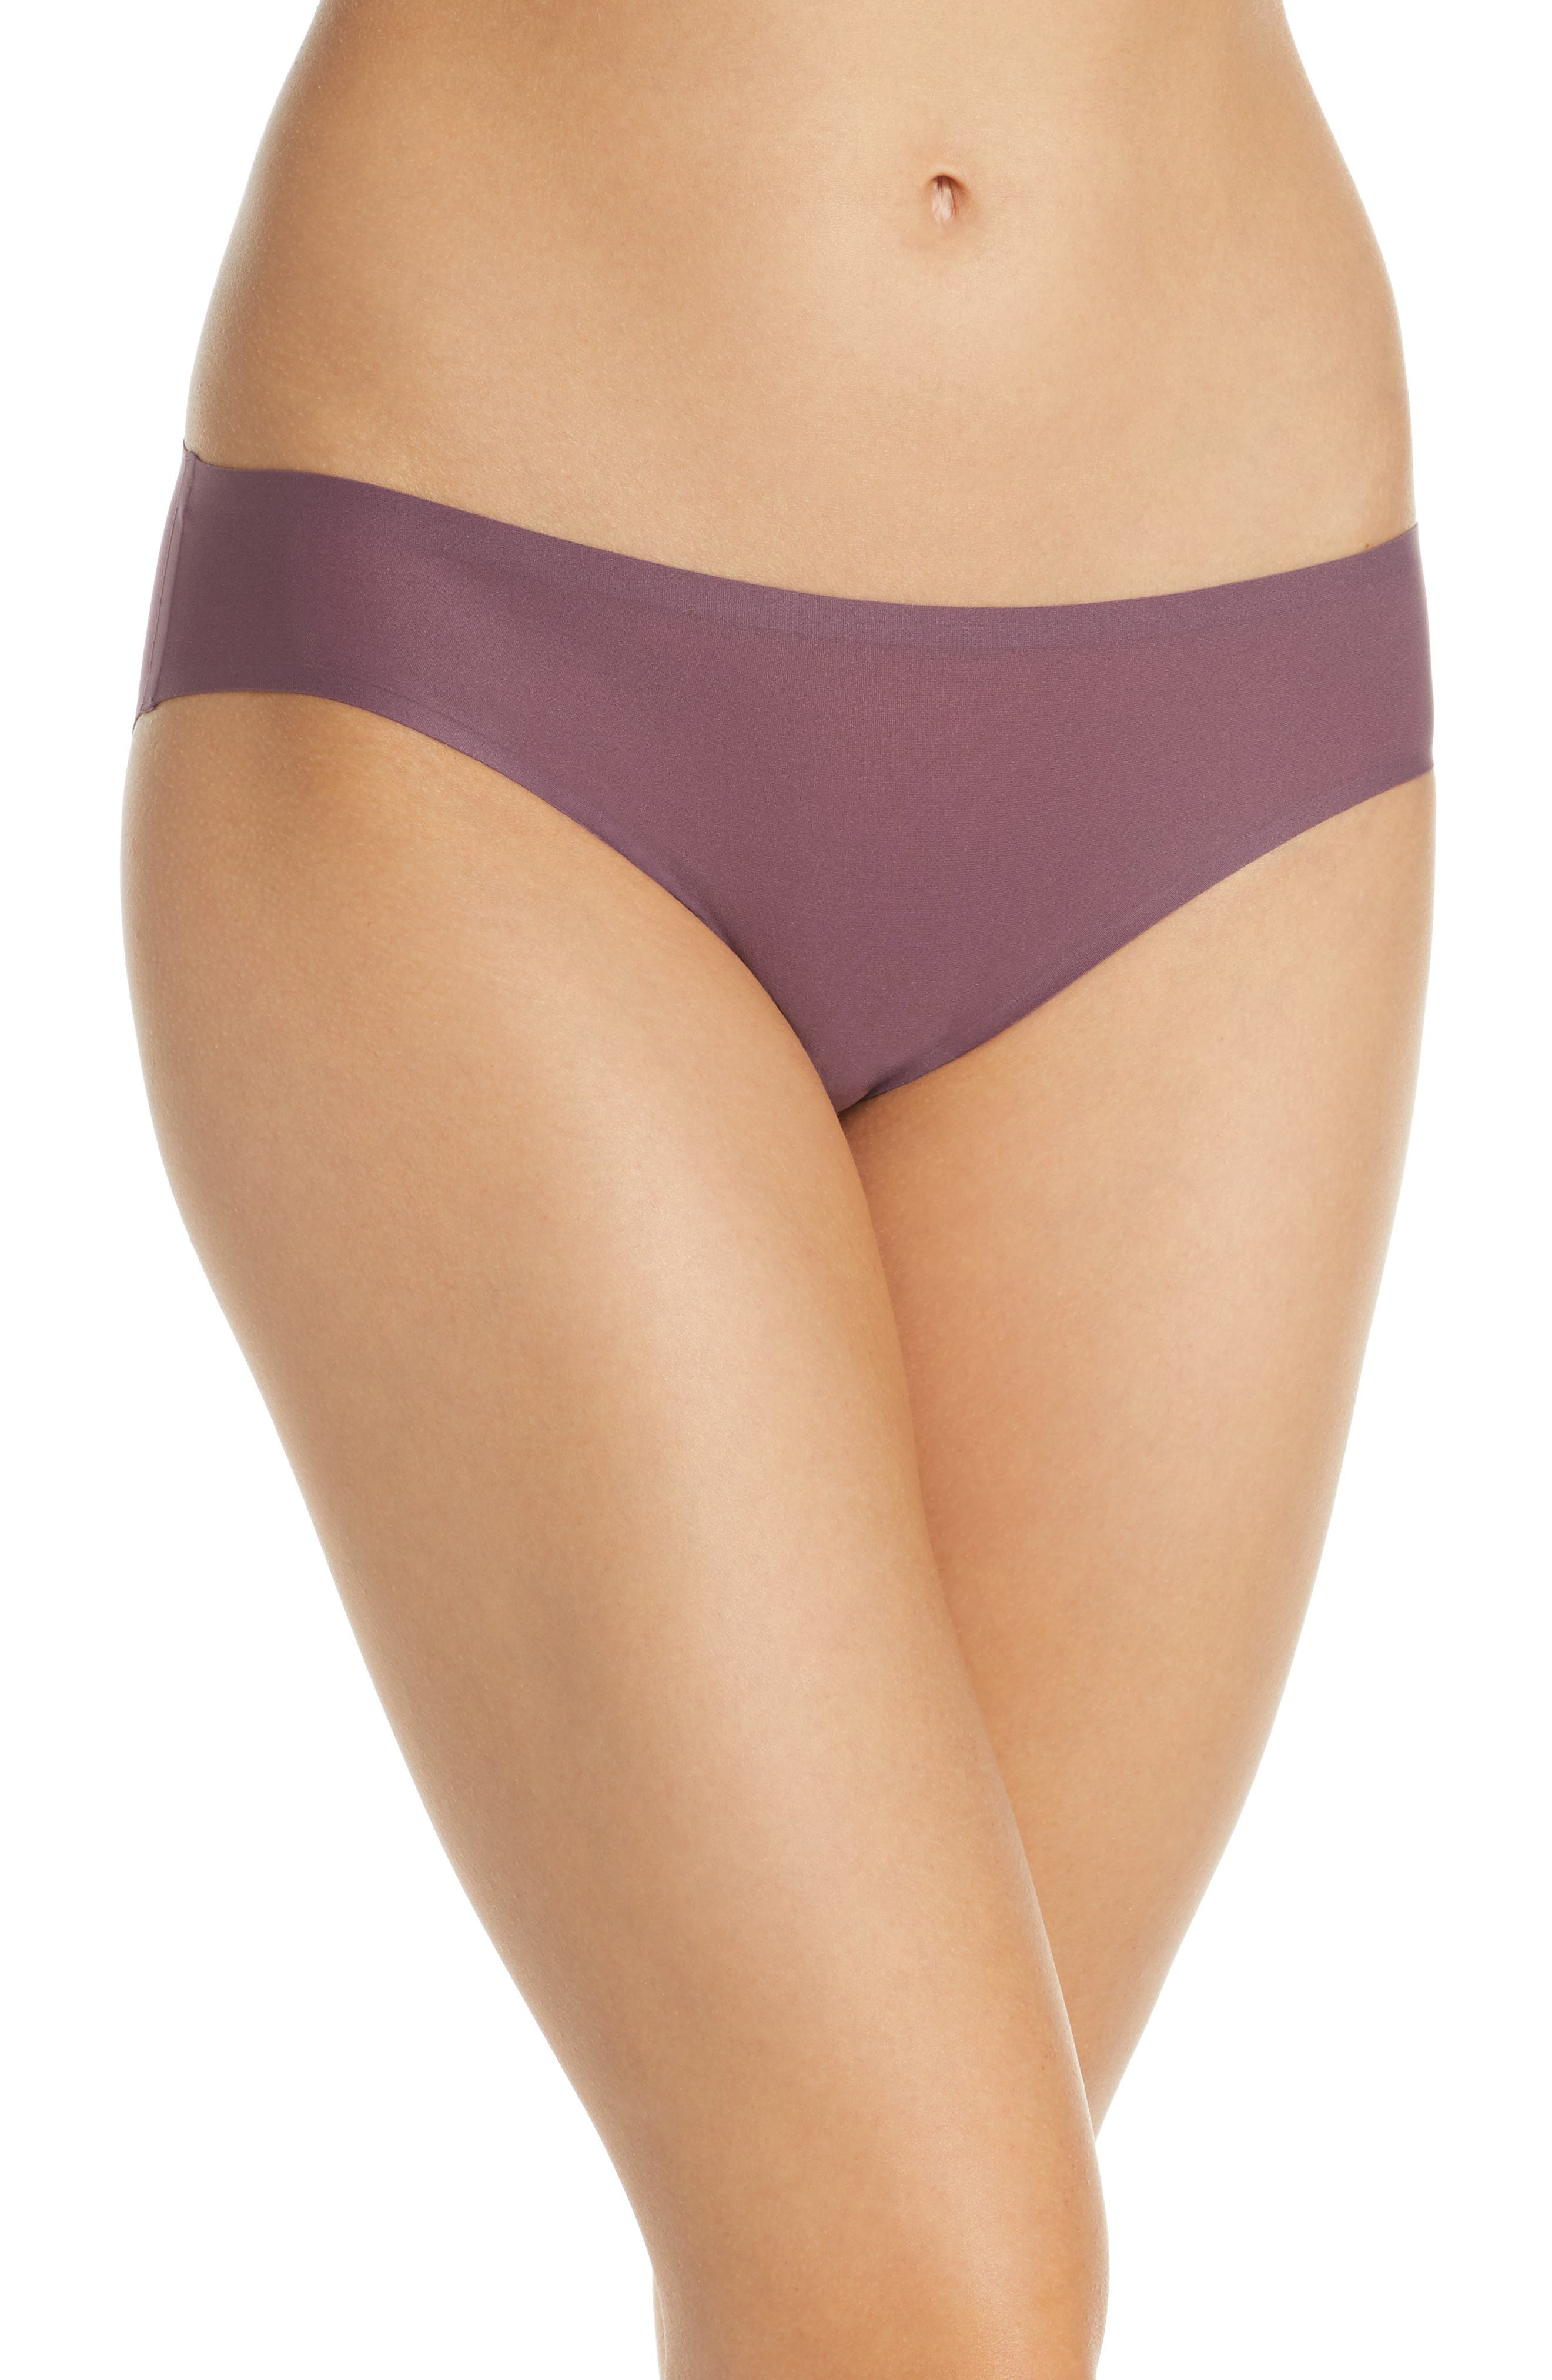 Chantelle Lingerie Soft Stretch Seamless Bikini (Any 3 for $40)